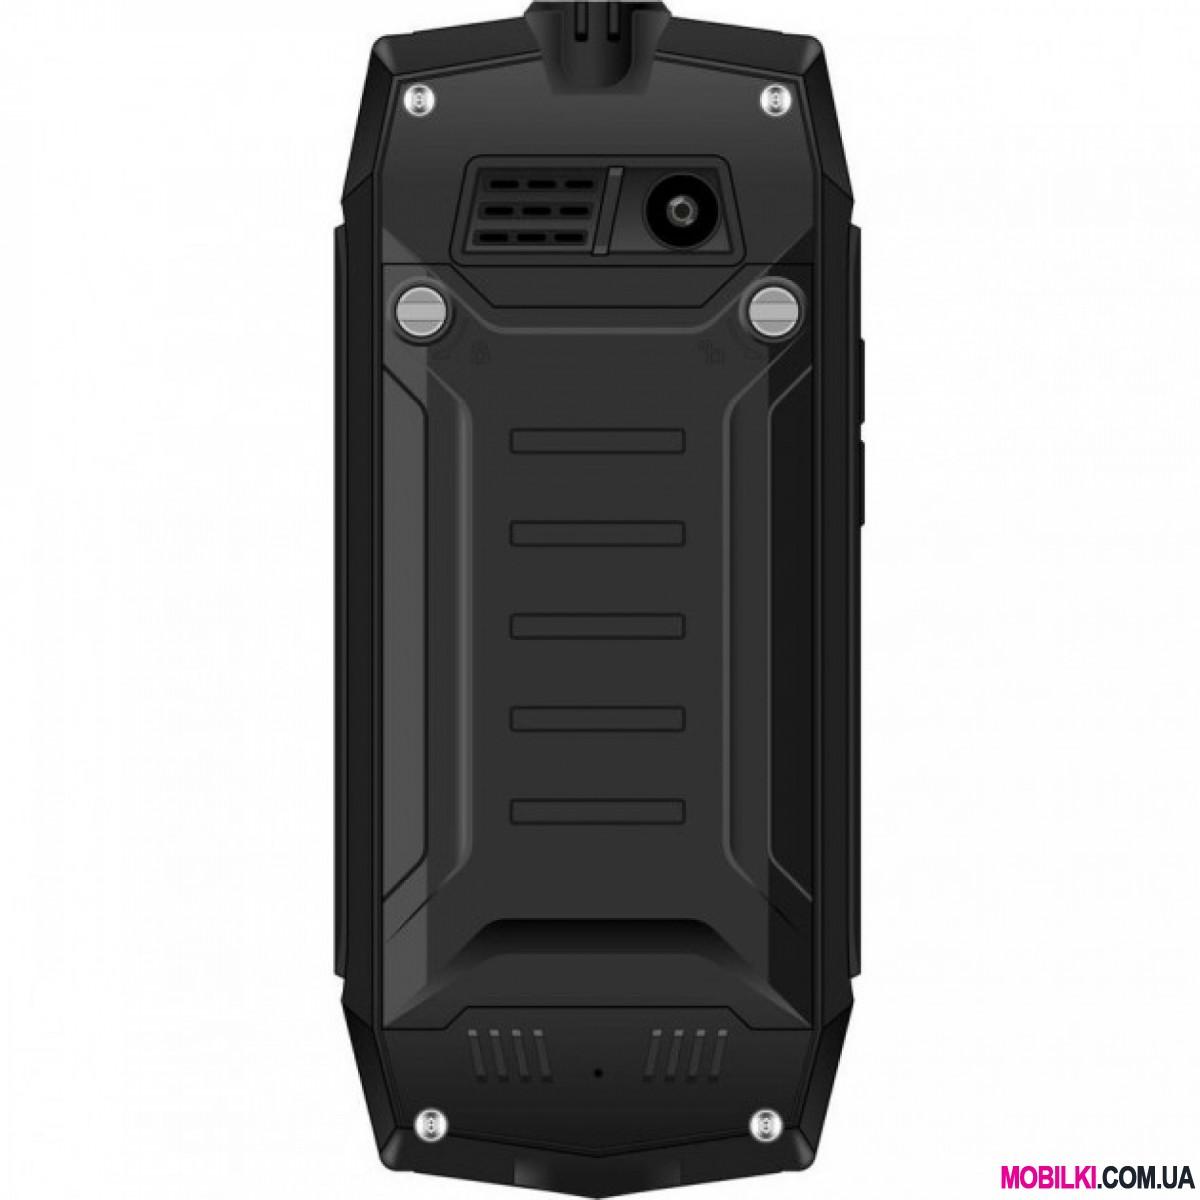 Sigma mobile X-treme DR68